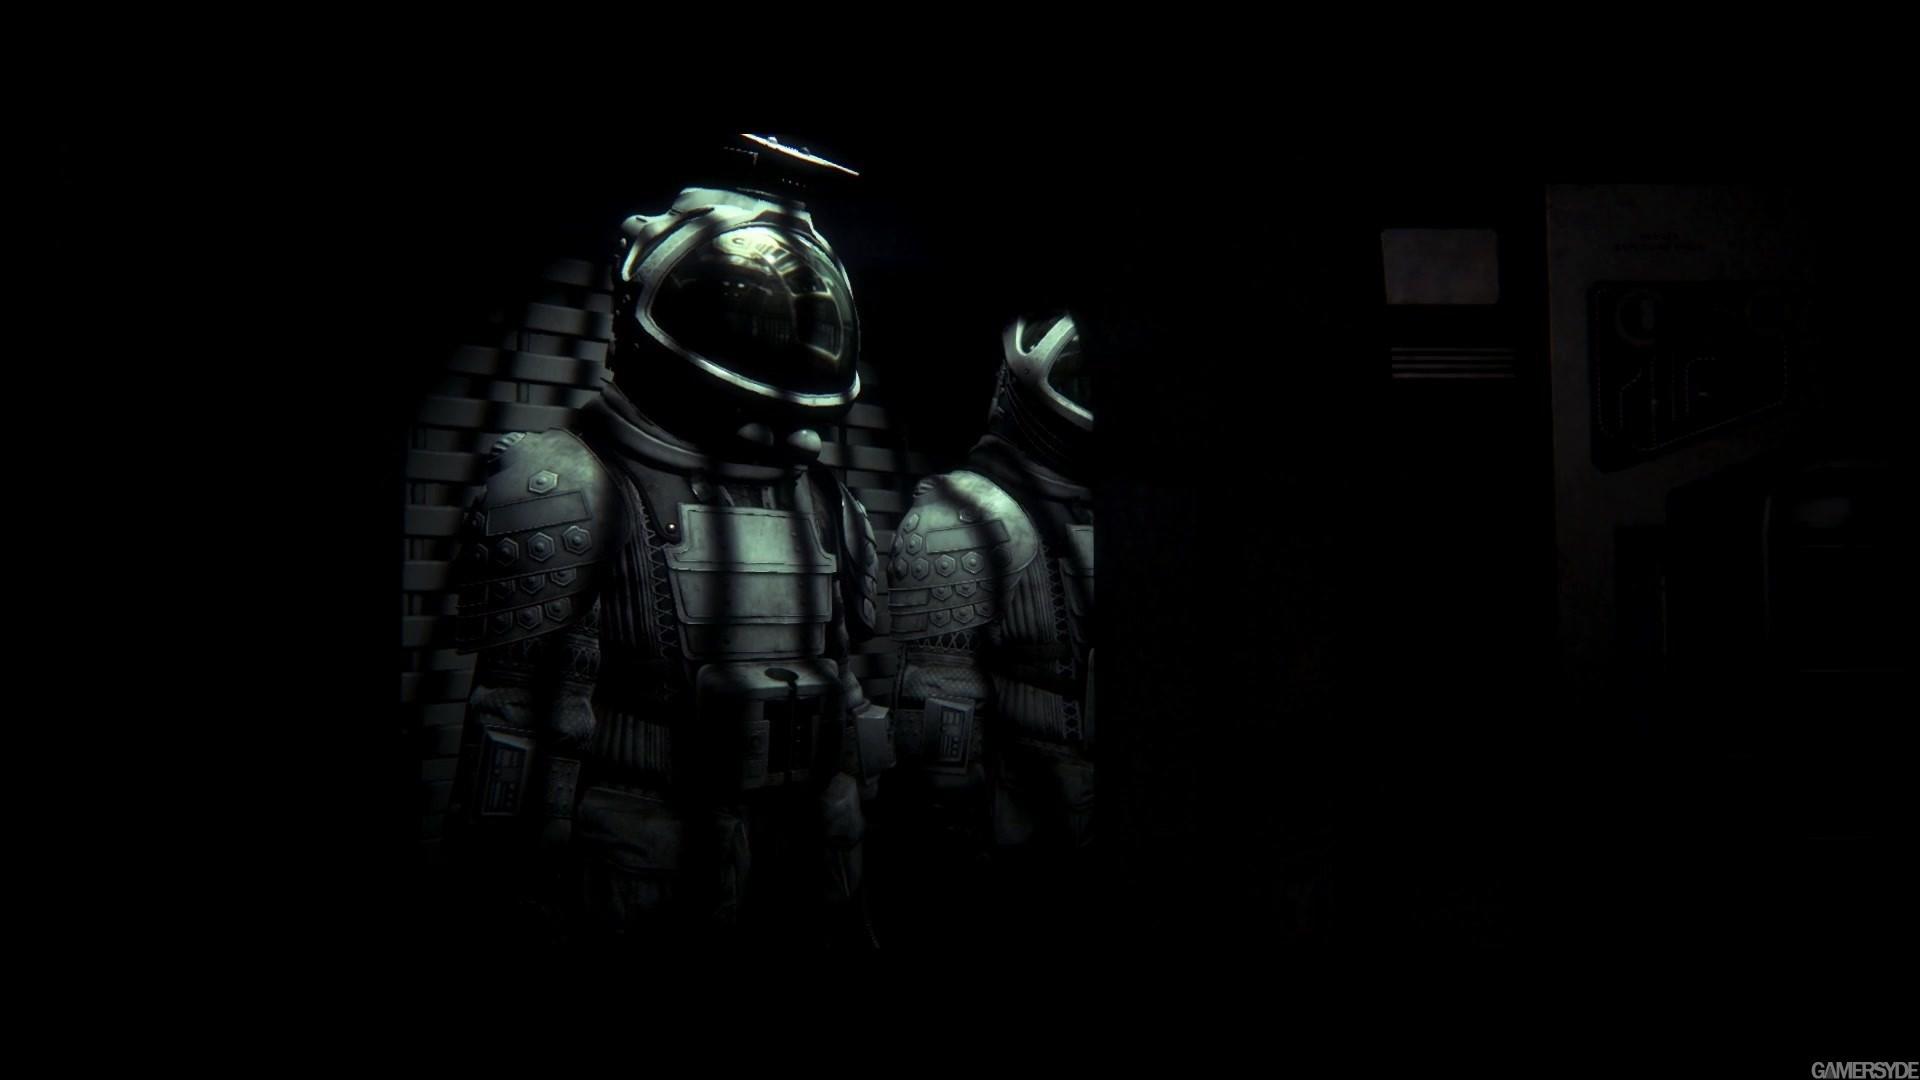 Galerie Alien: Isolation – Fichier: Origins (1920×1080) – 2014-01-08  14:34:31